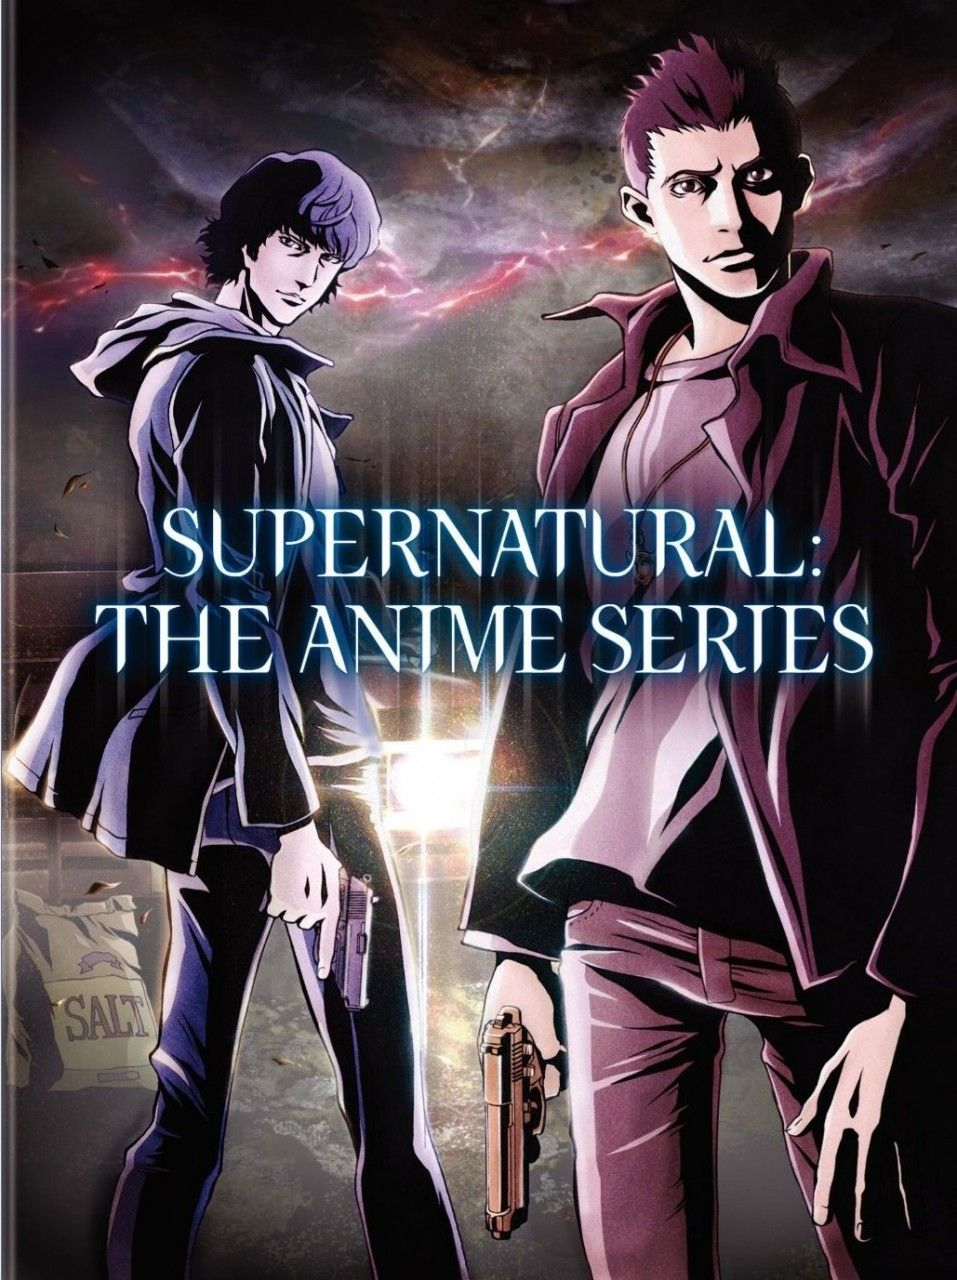 Pin by 𝕄ona on Tv series madness Supernatural seasons